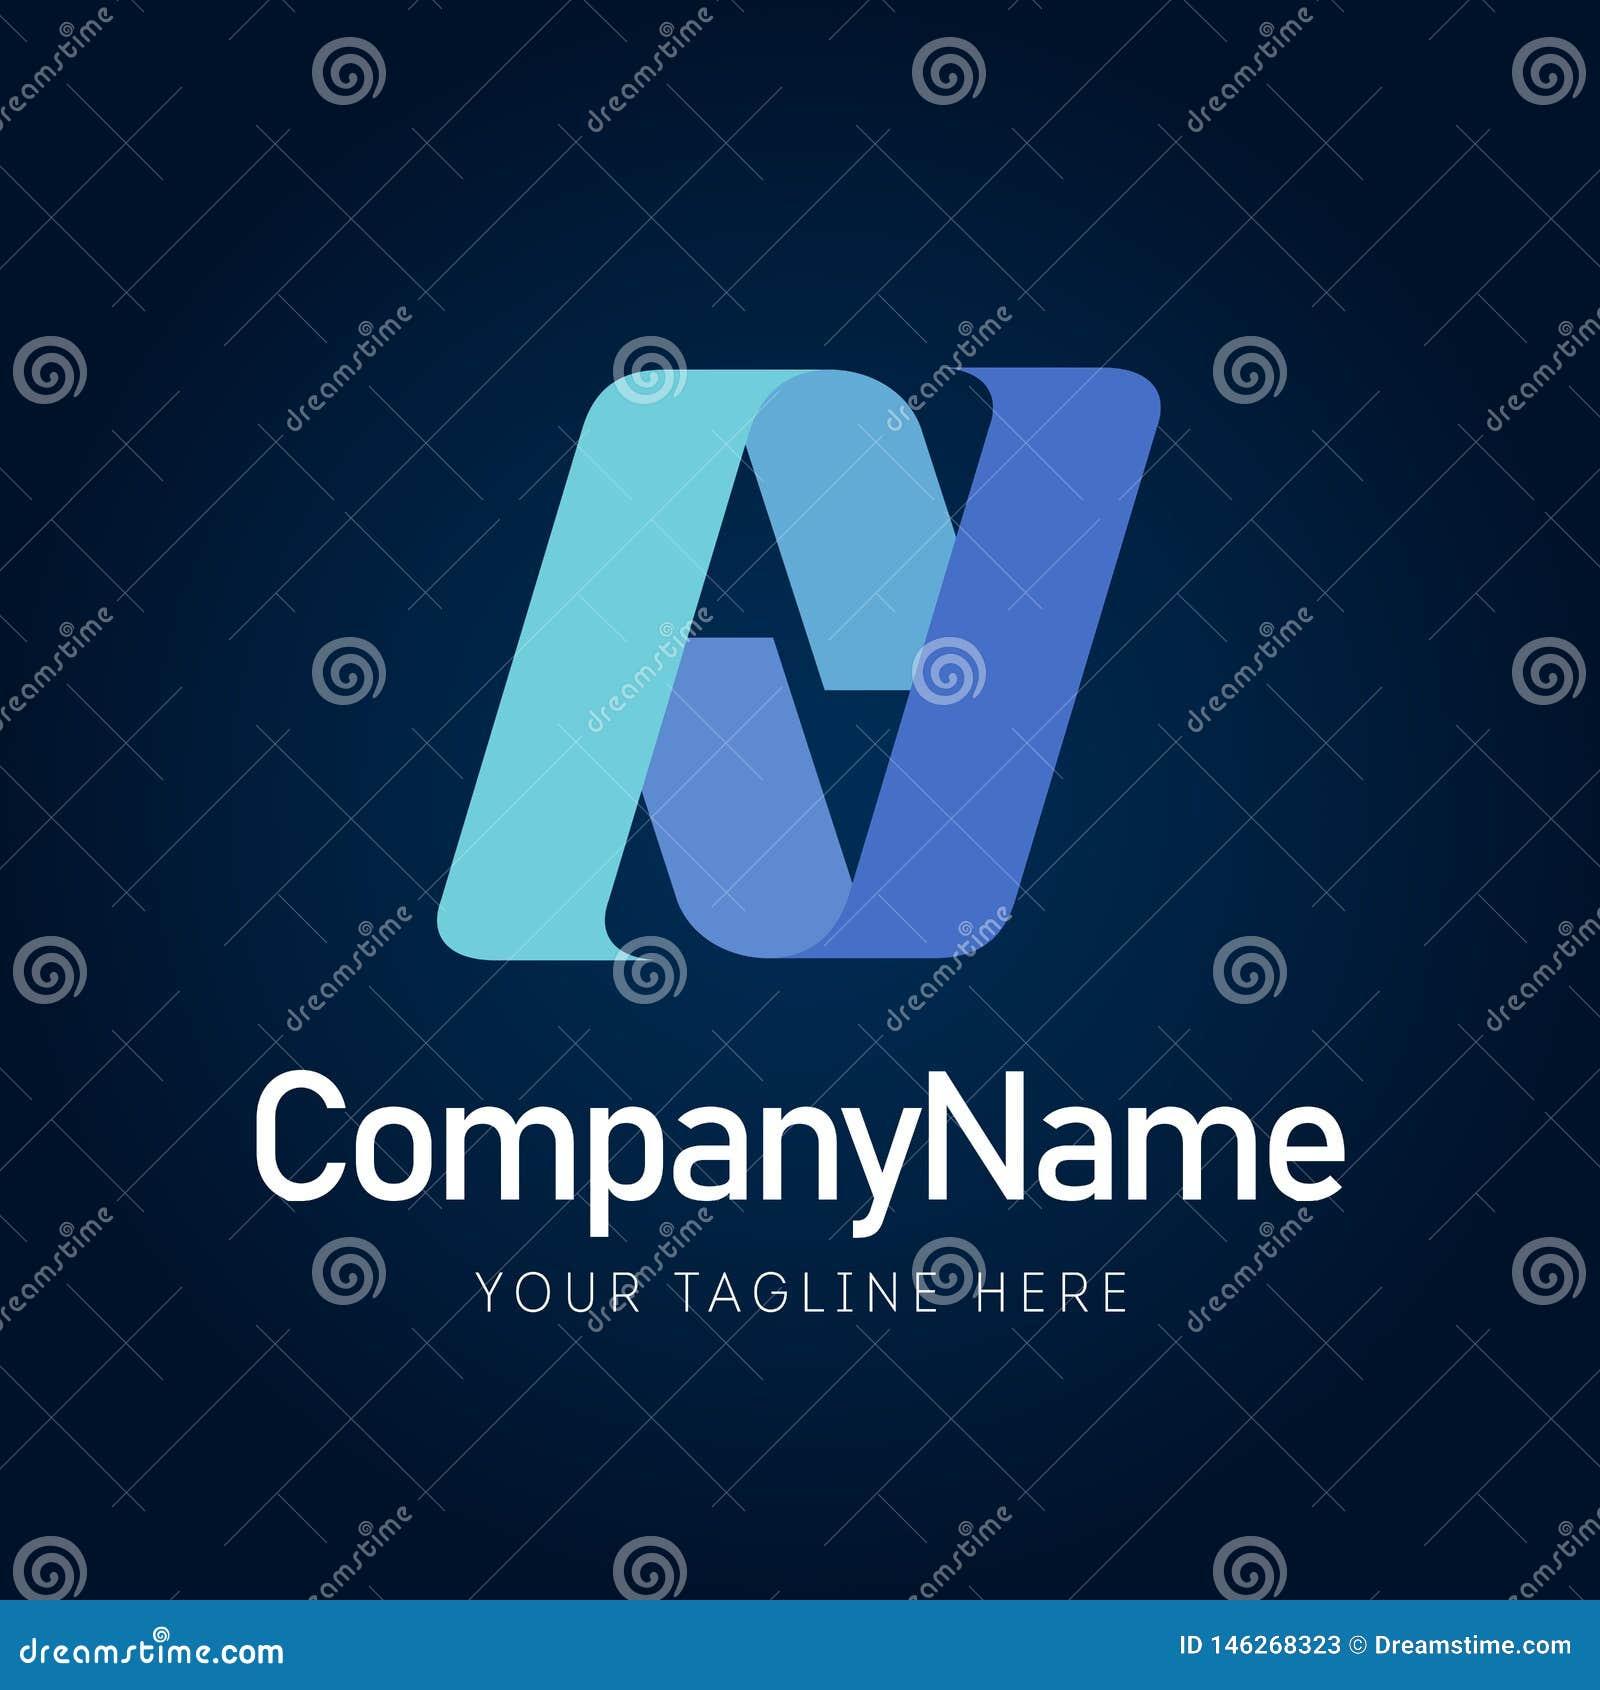 Sign AV bussines logo element icon company